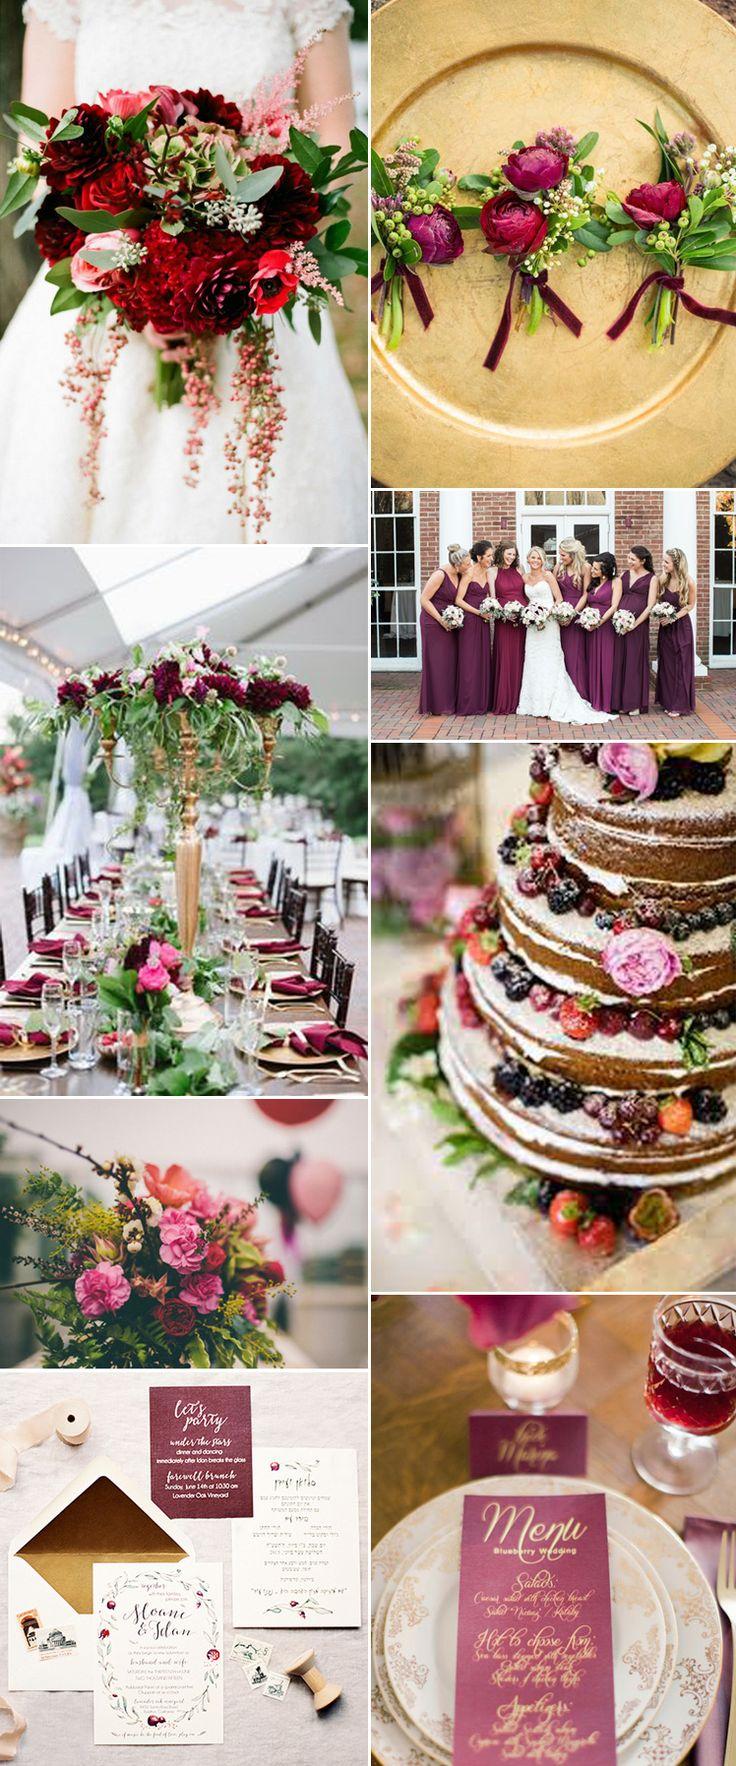 sensational berry wedding inspiration